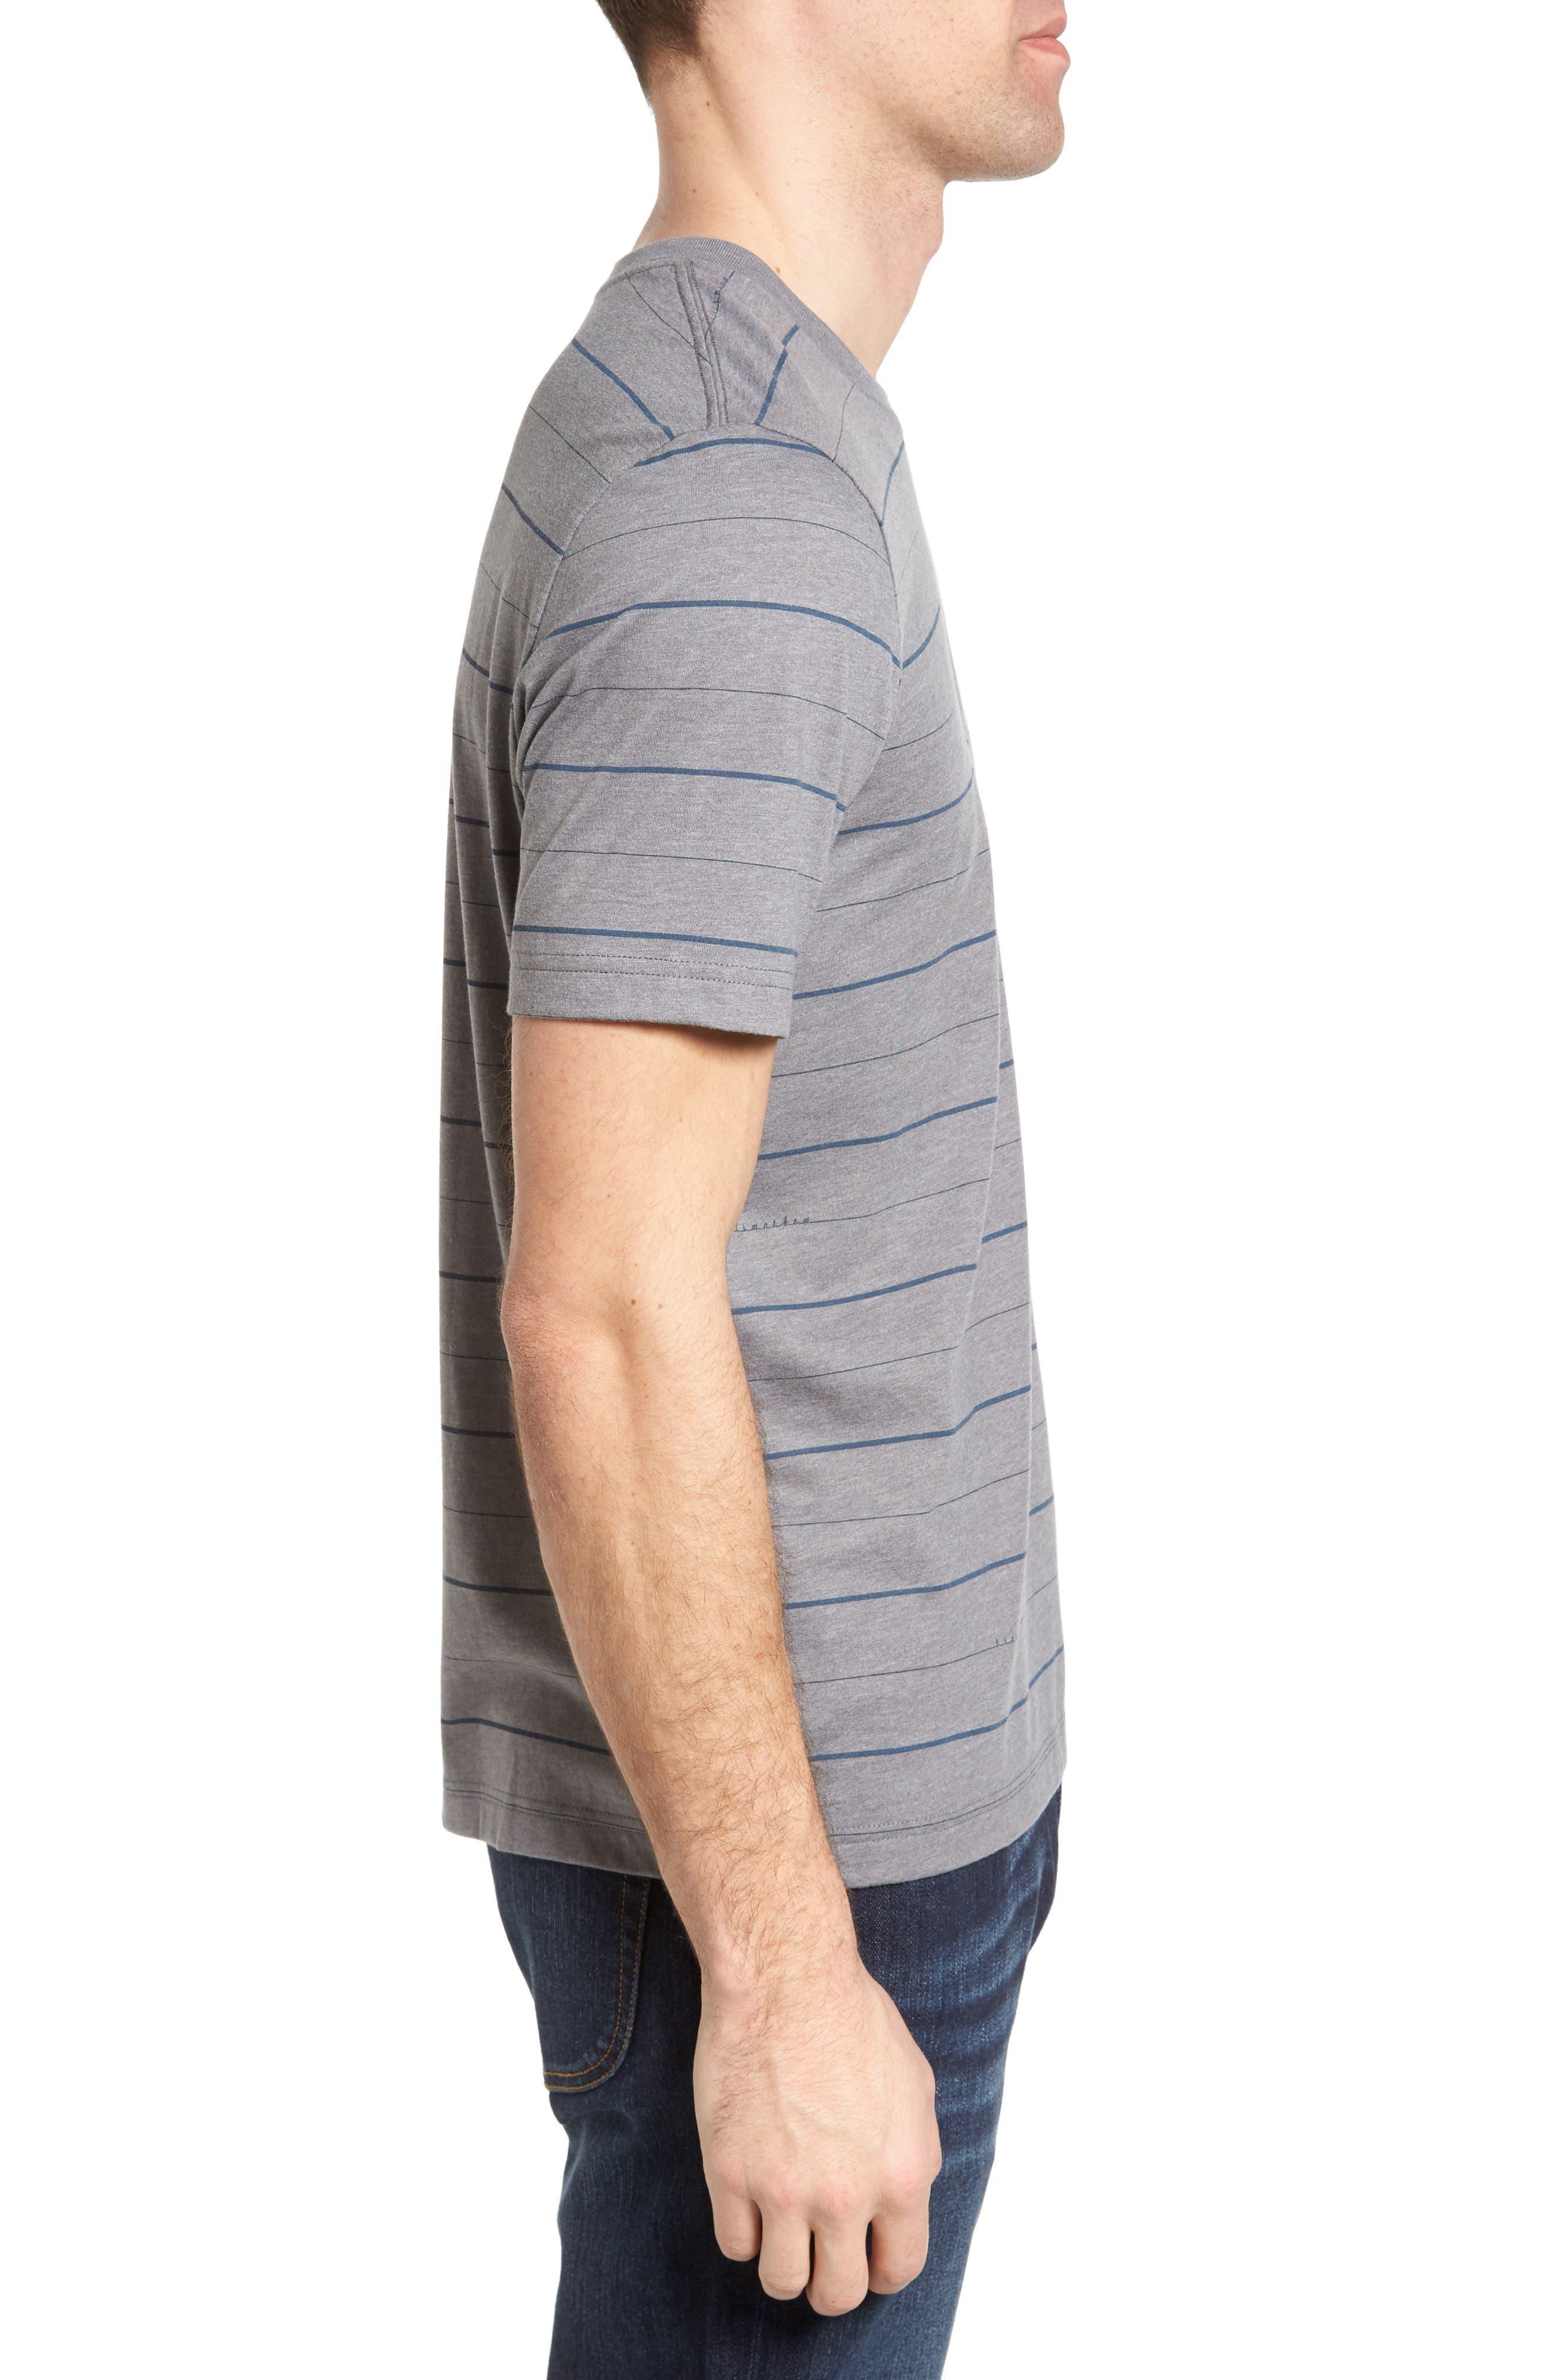 Hodapp T-Shirt,                             Alternate thumbnail 3, color,                             020